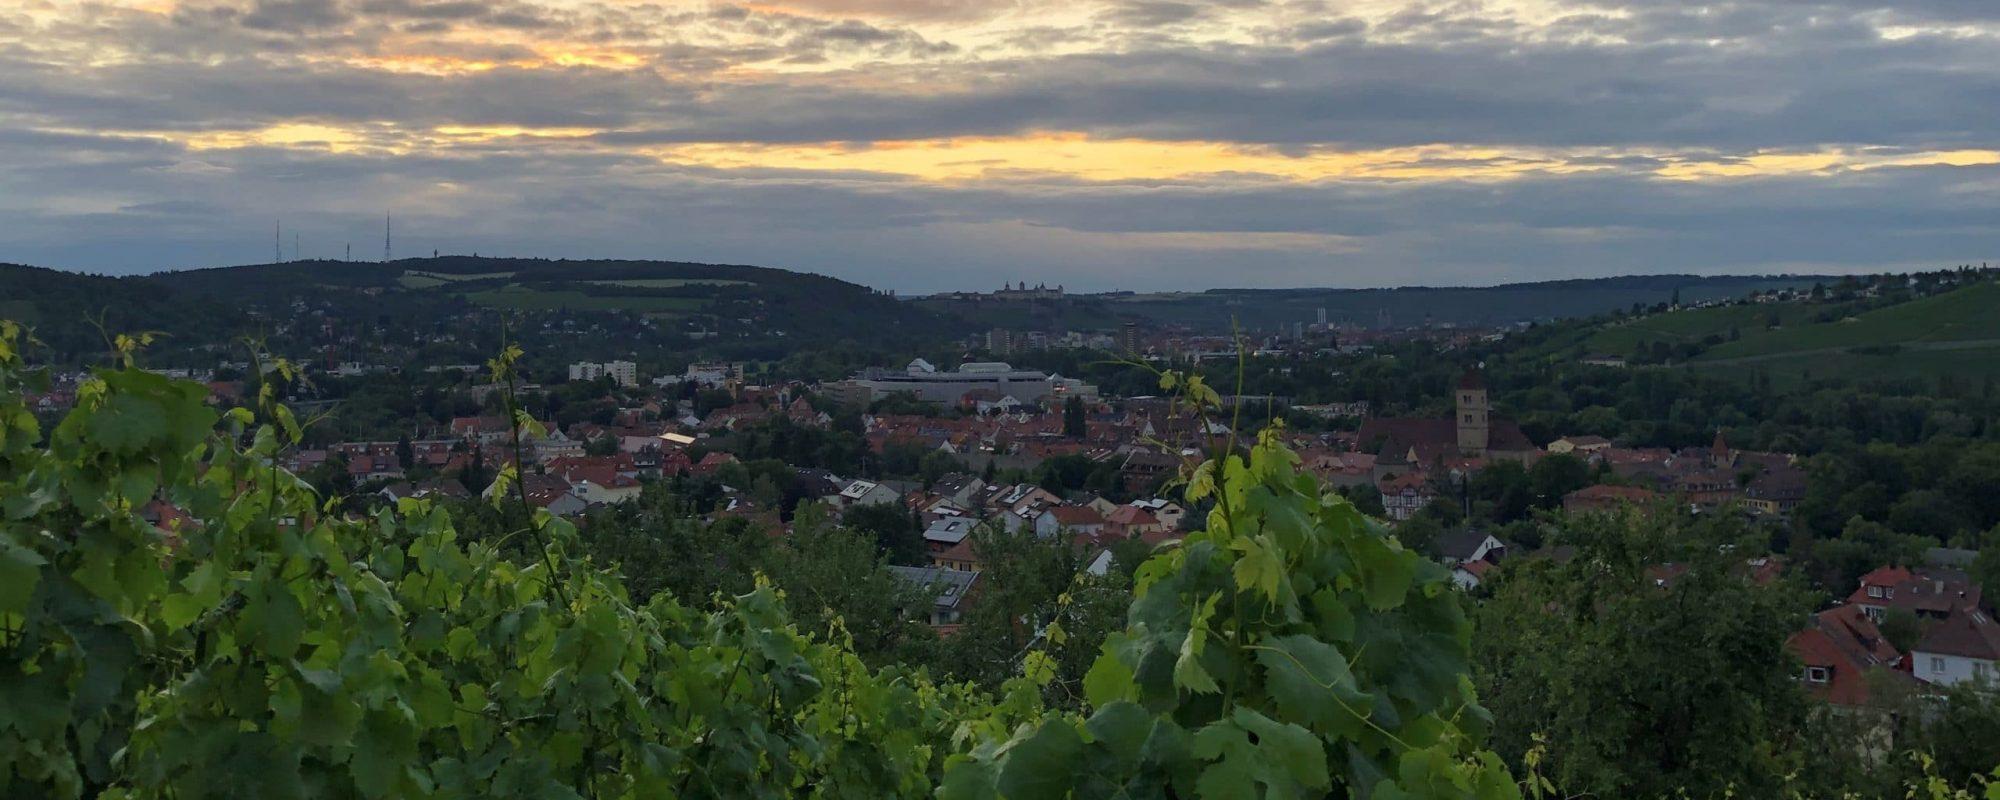 Heidingsfeld Stadtteil